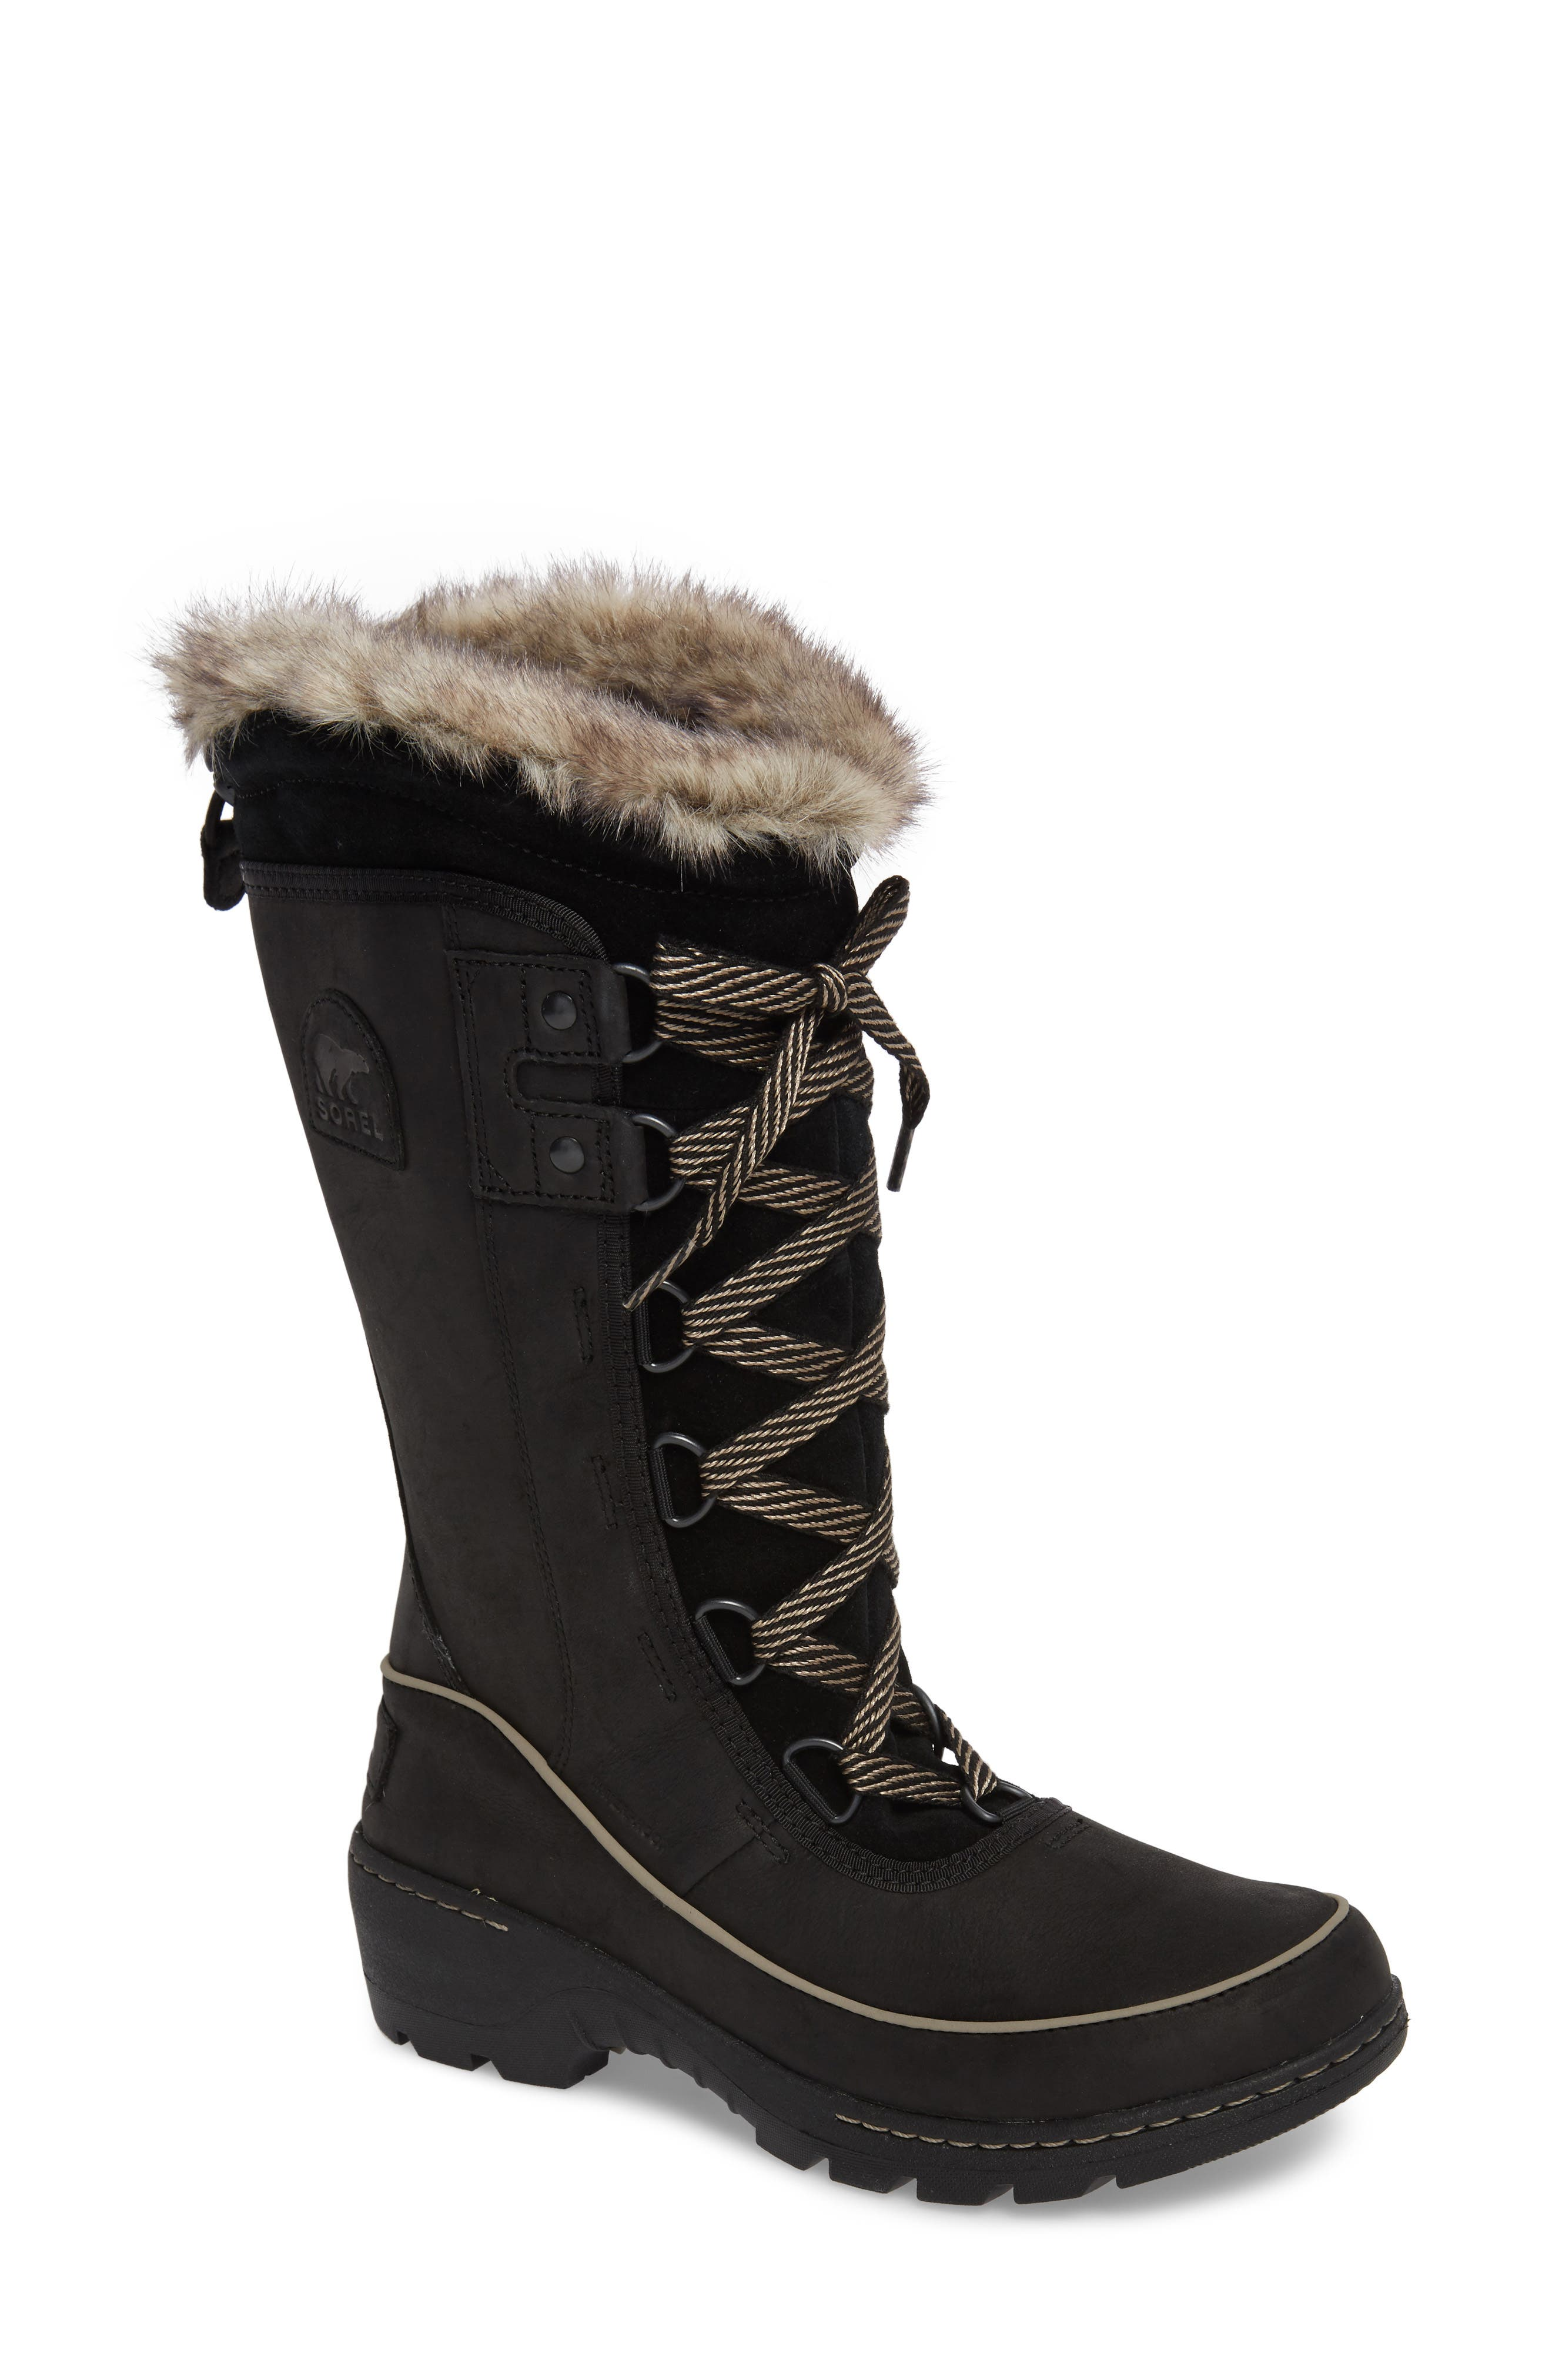 Tivoli II Insulated Winter Boot with Faux Fur Trim,                         Main,                         color, 010